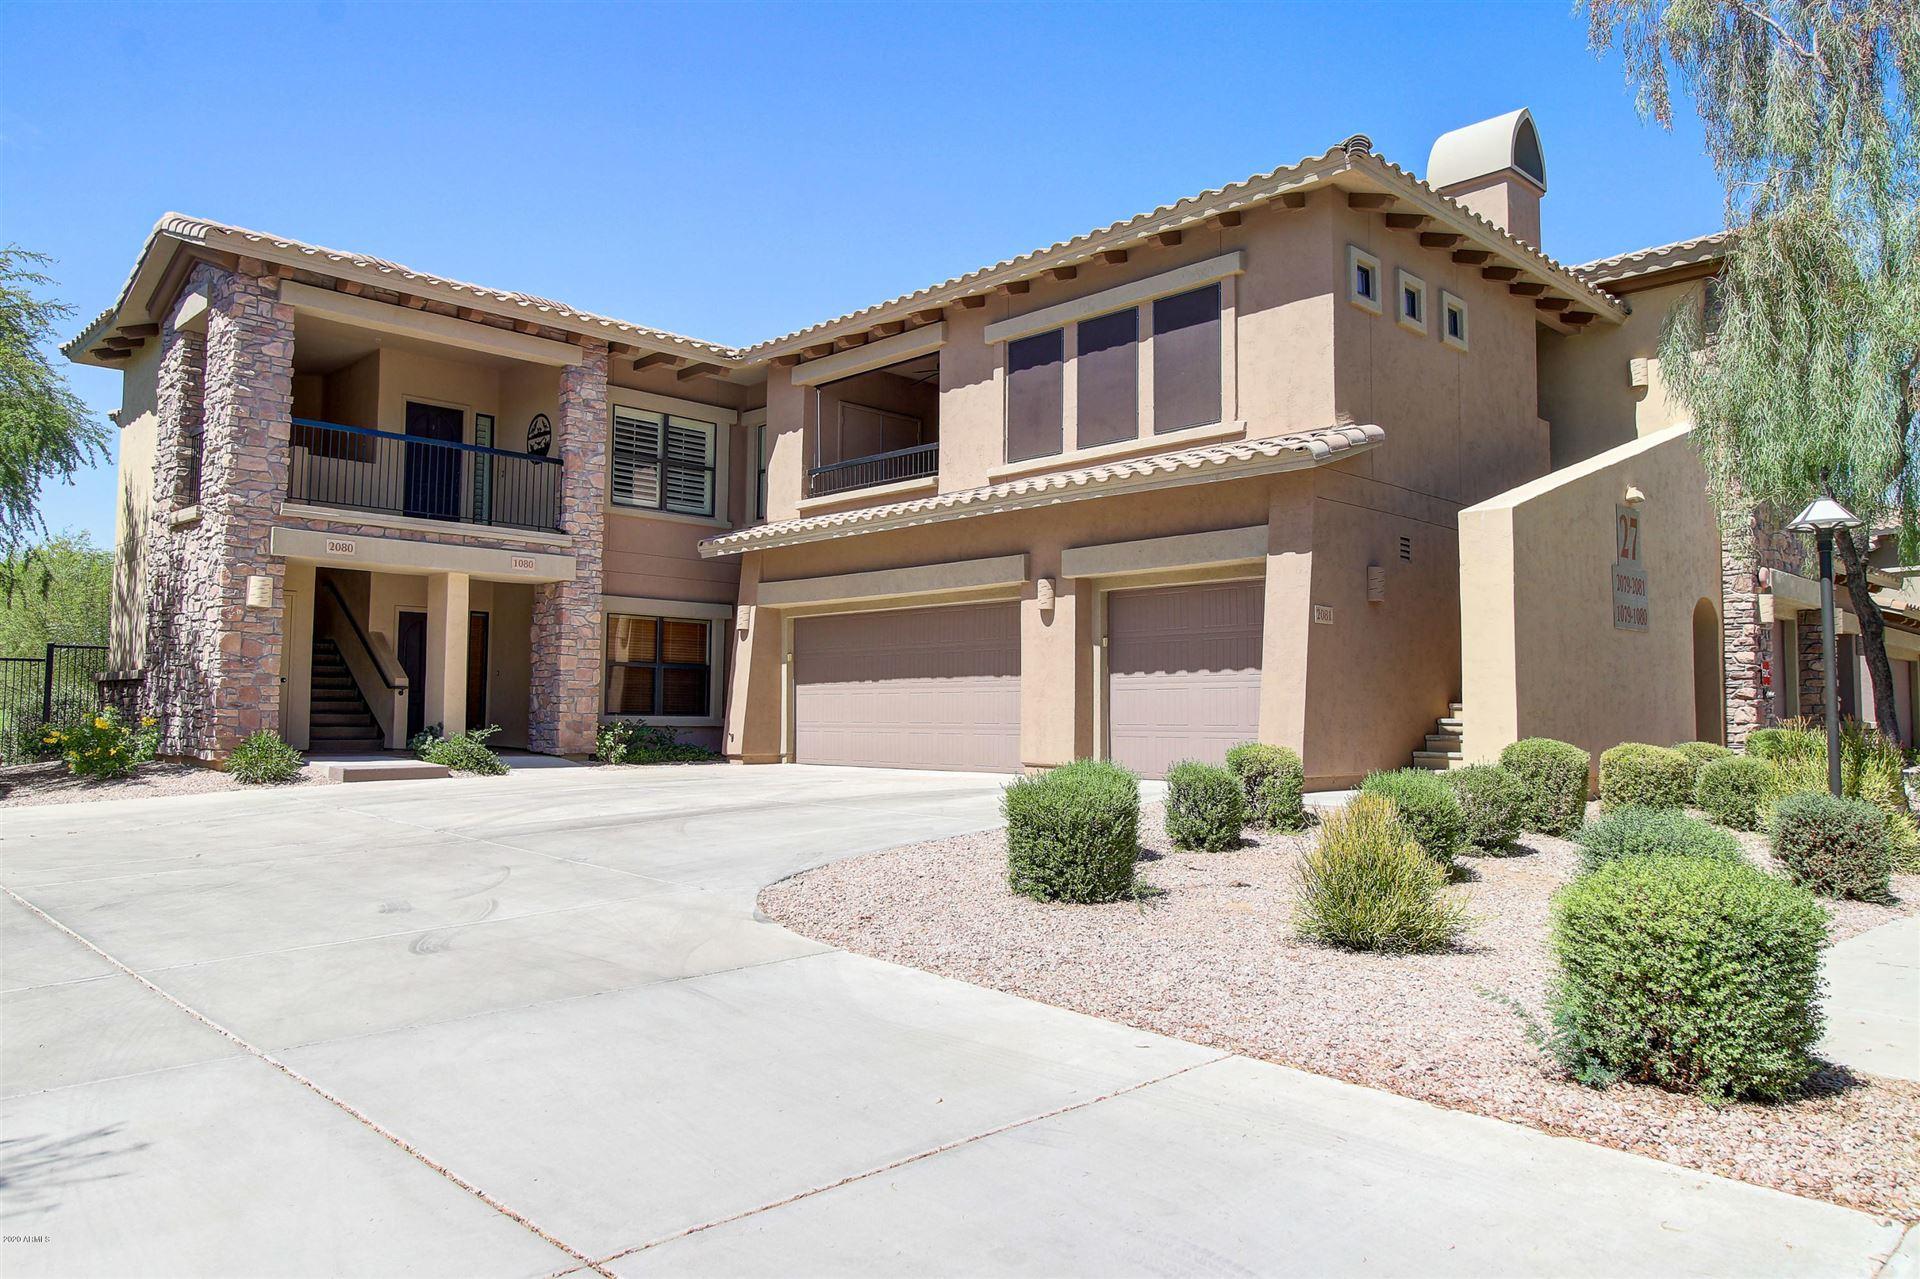 21320 N 56TH Street #2080, Phoenix, AZ 85054 - MLS#: 6096658